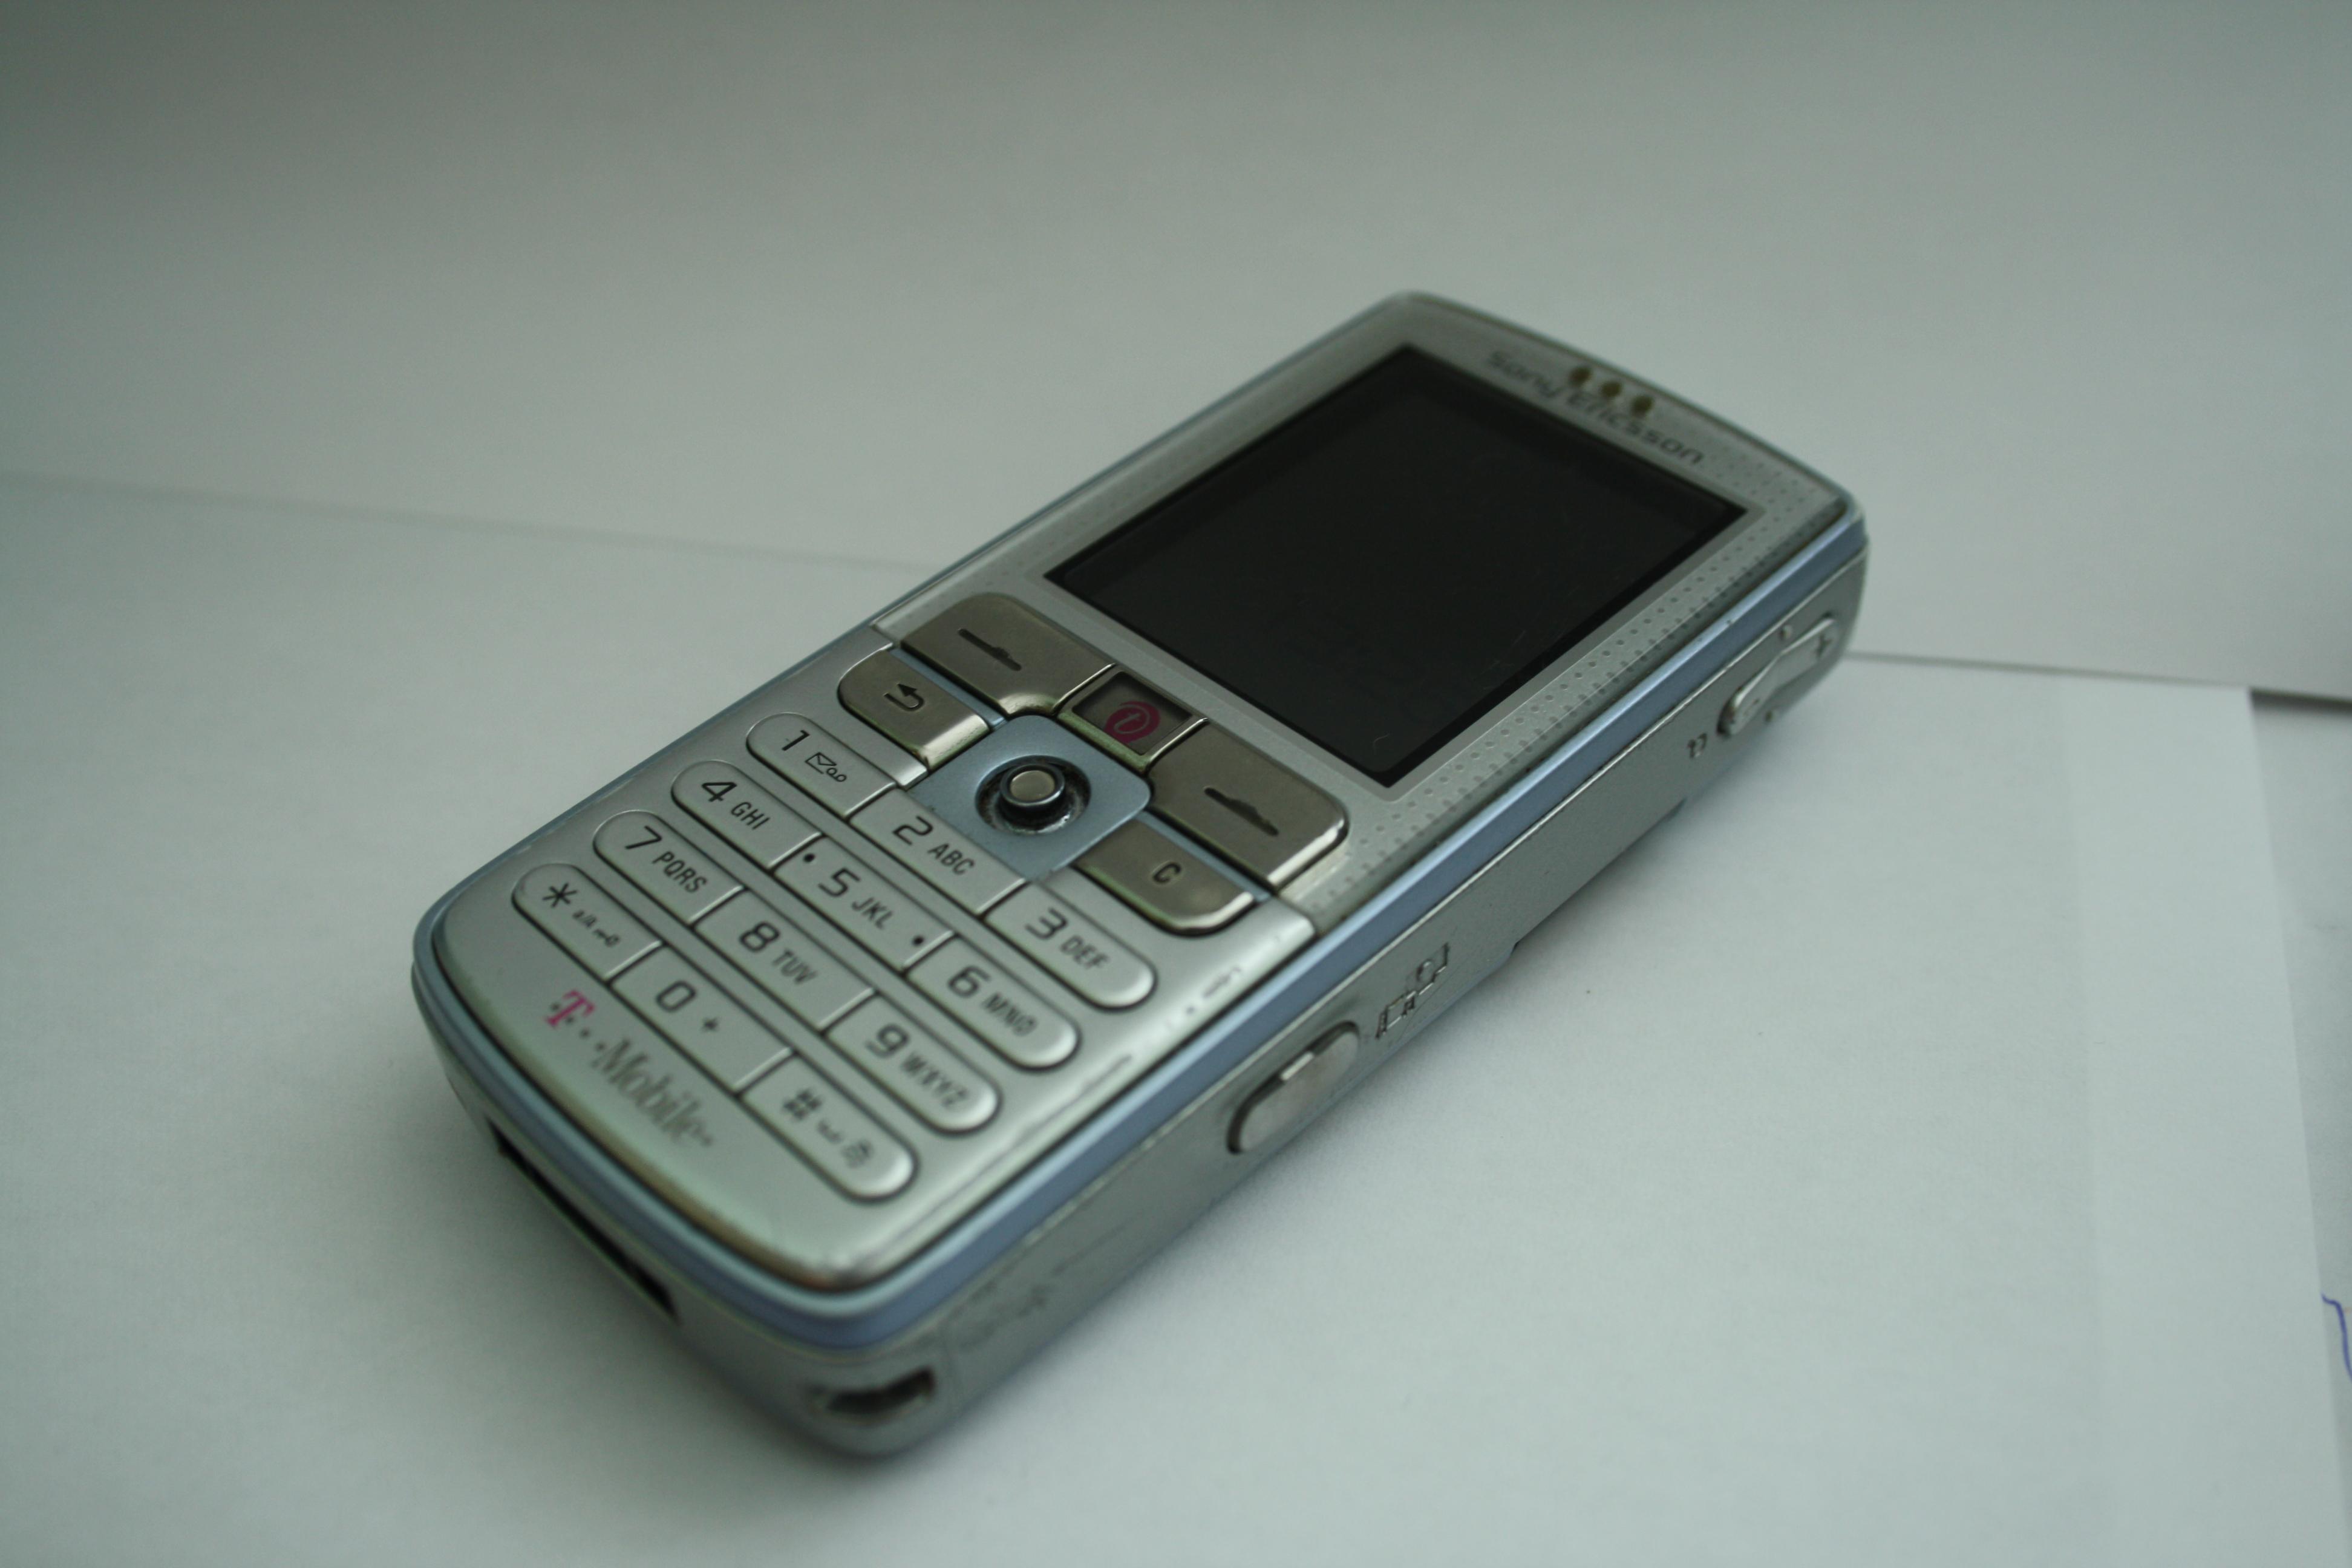 Download Driver Sony Ericsson Ki Windows 7 - programcoast